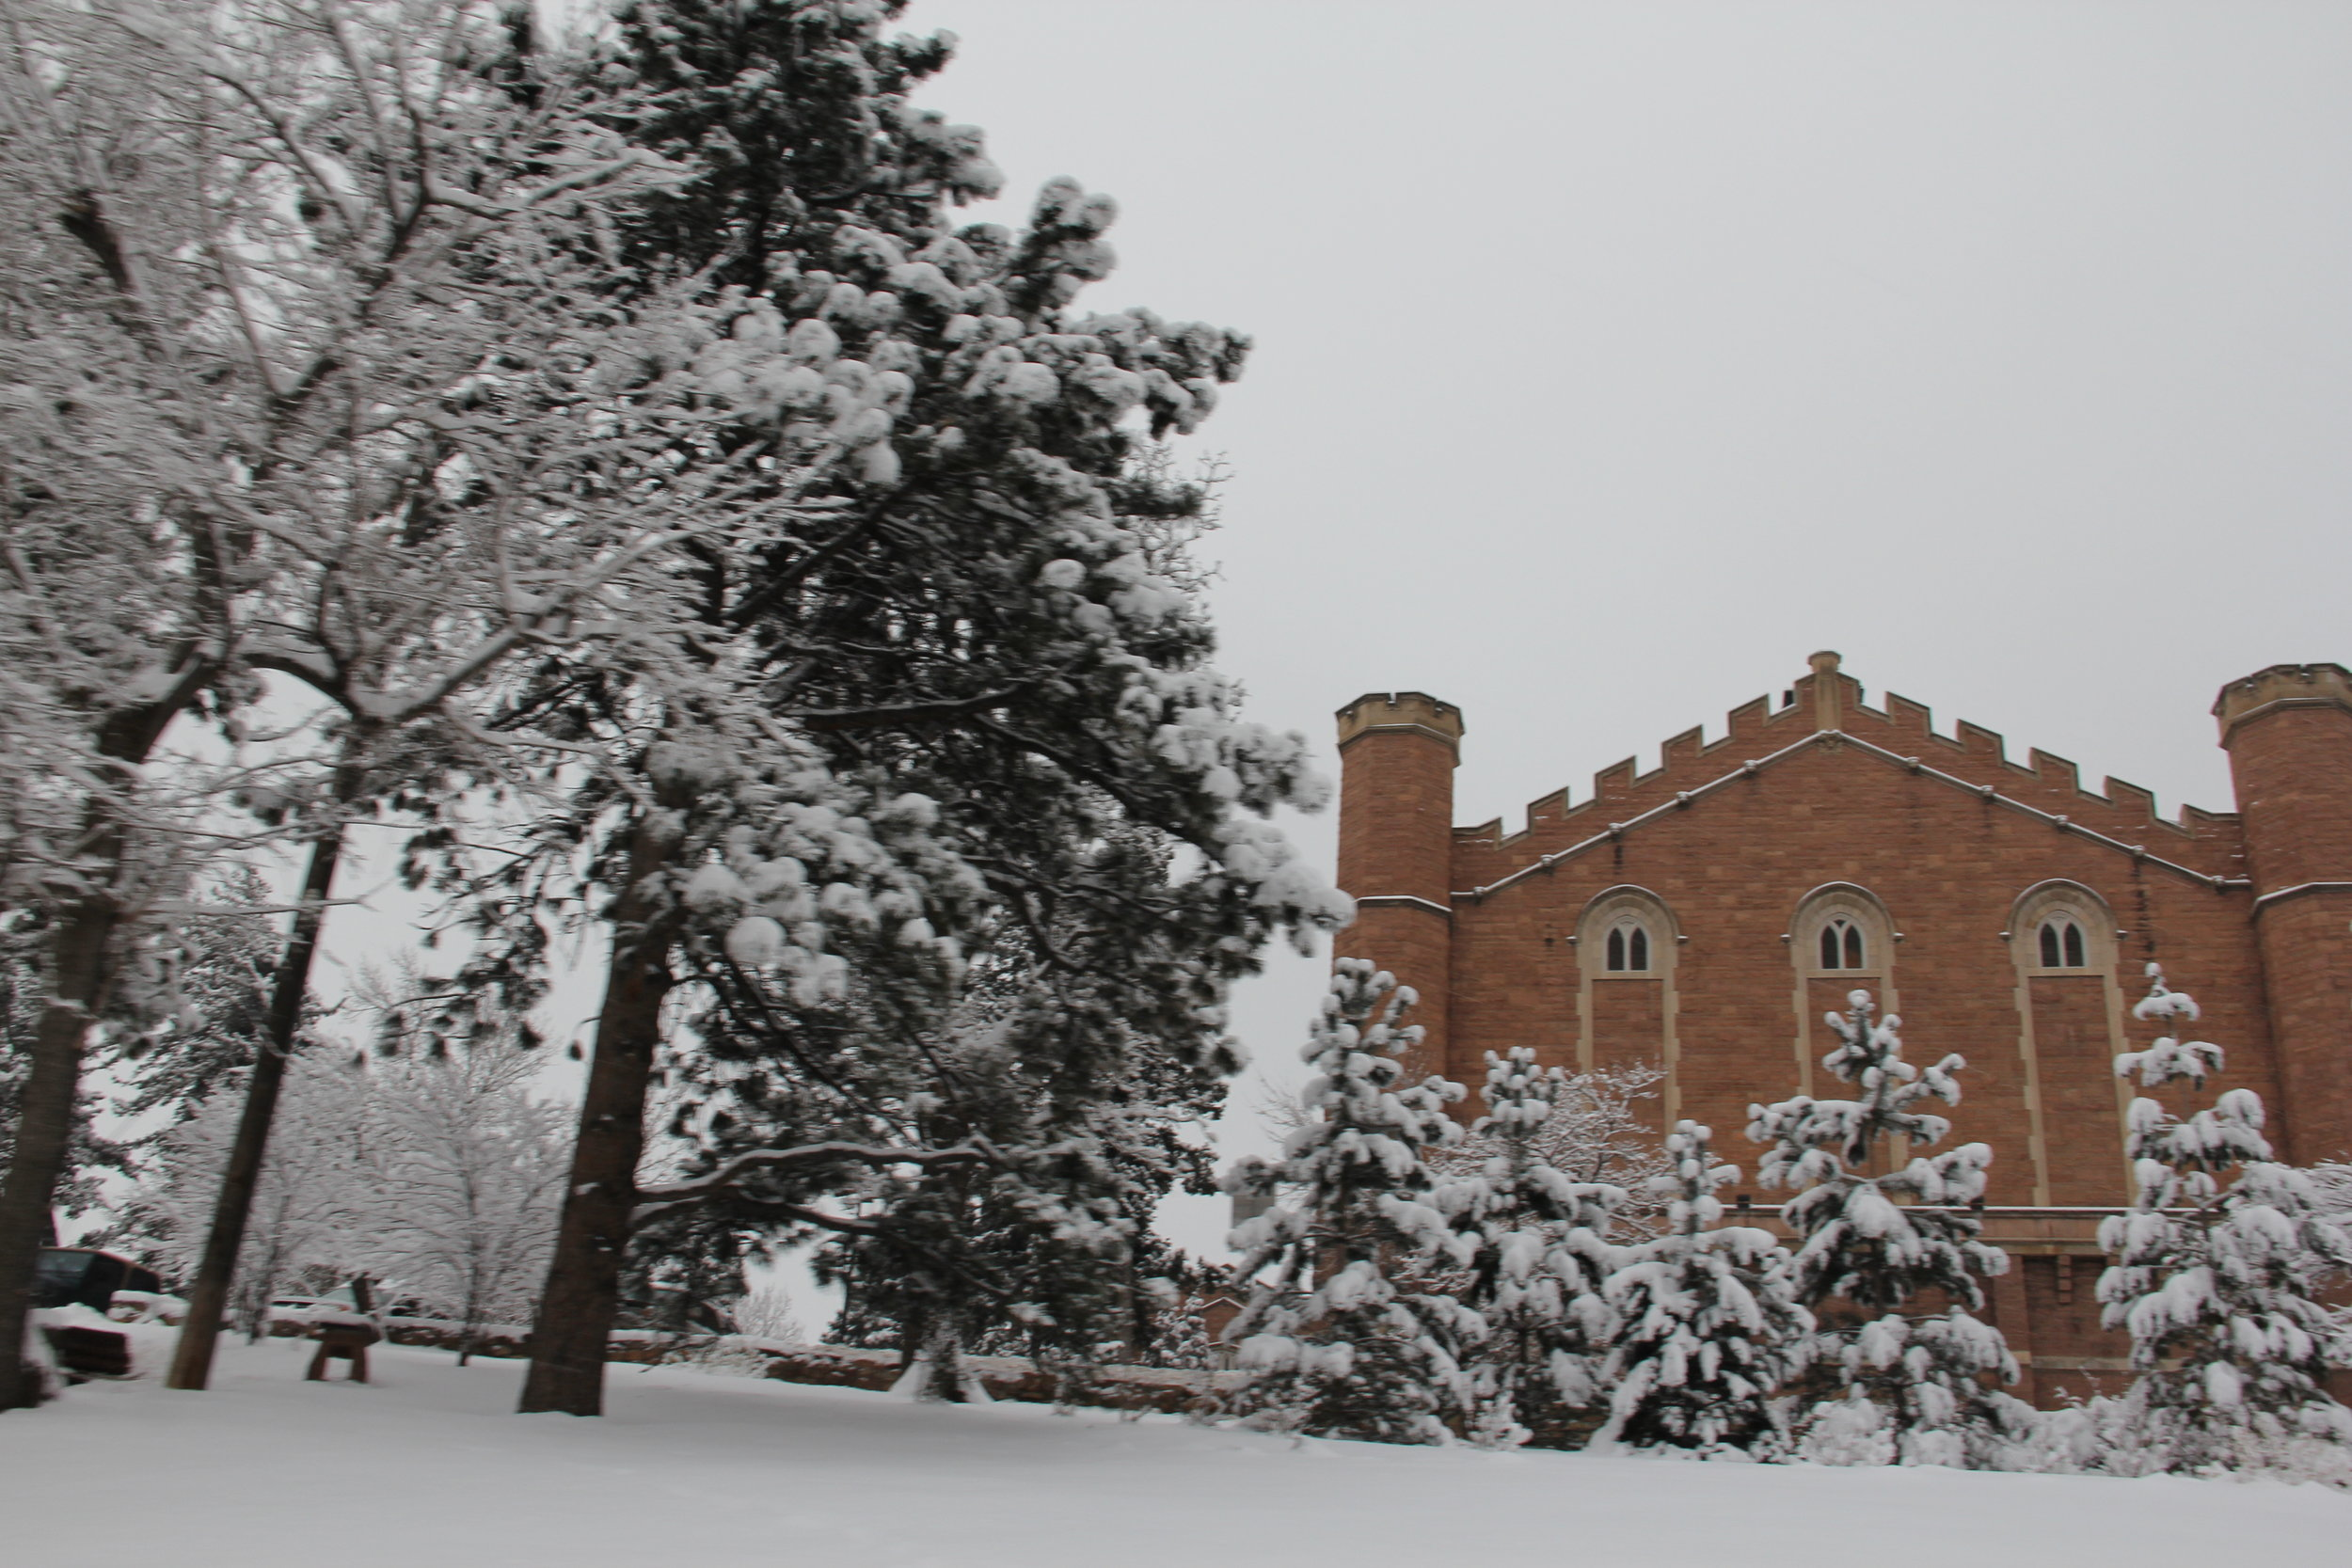 The snow outside Macky Auditorium at CU-Boulder.